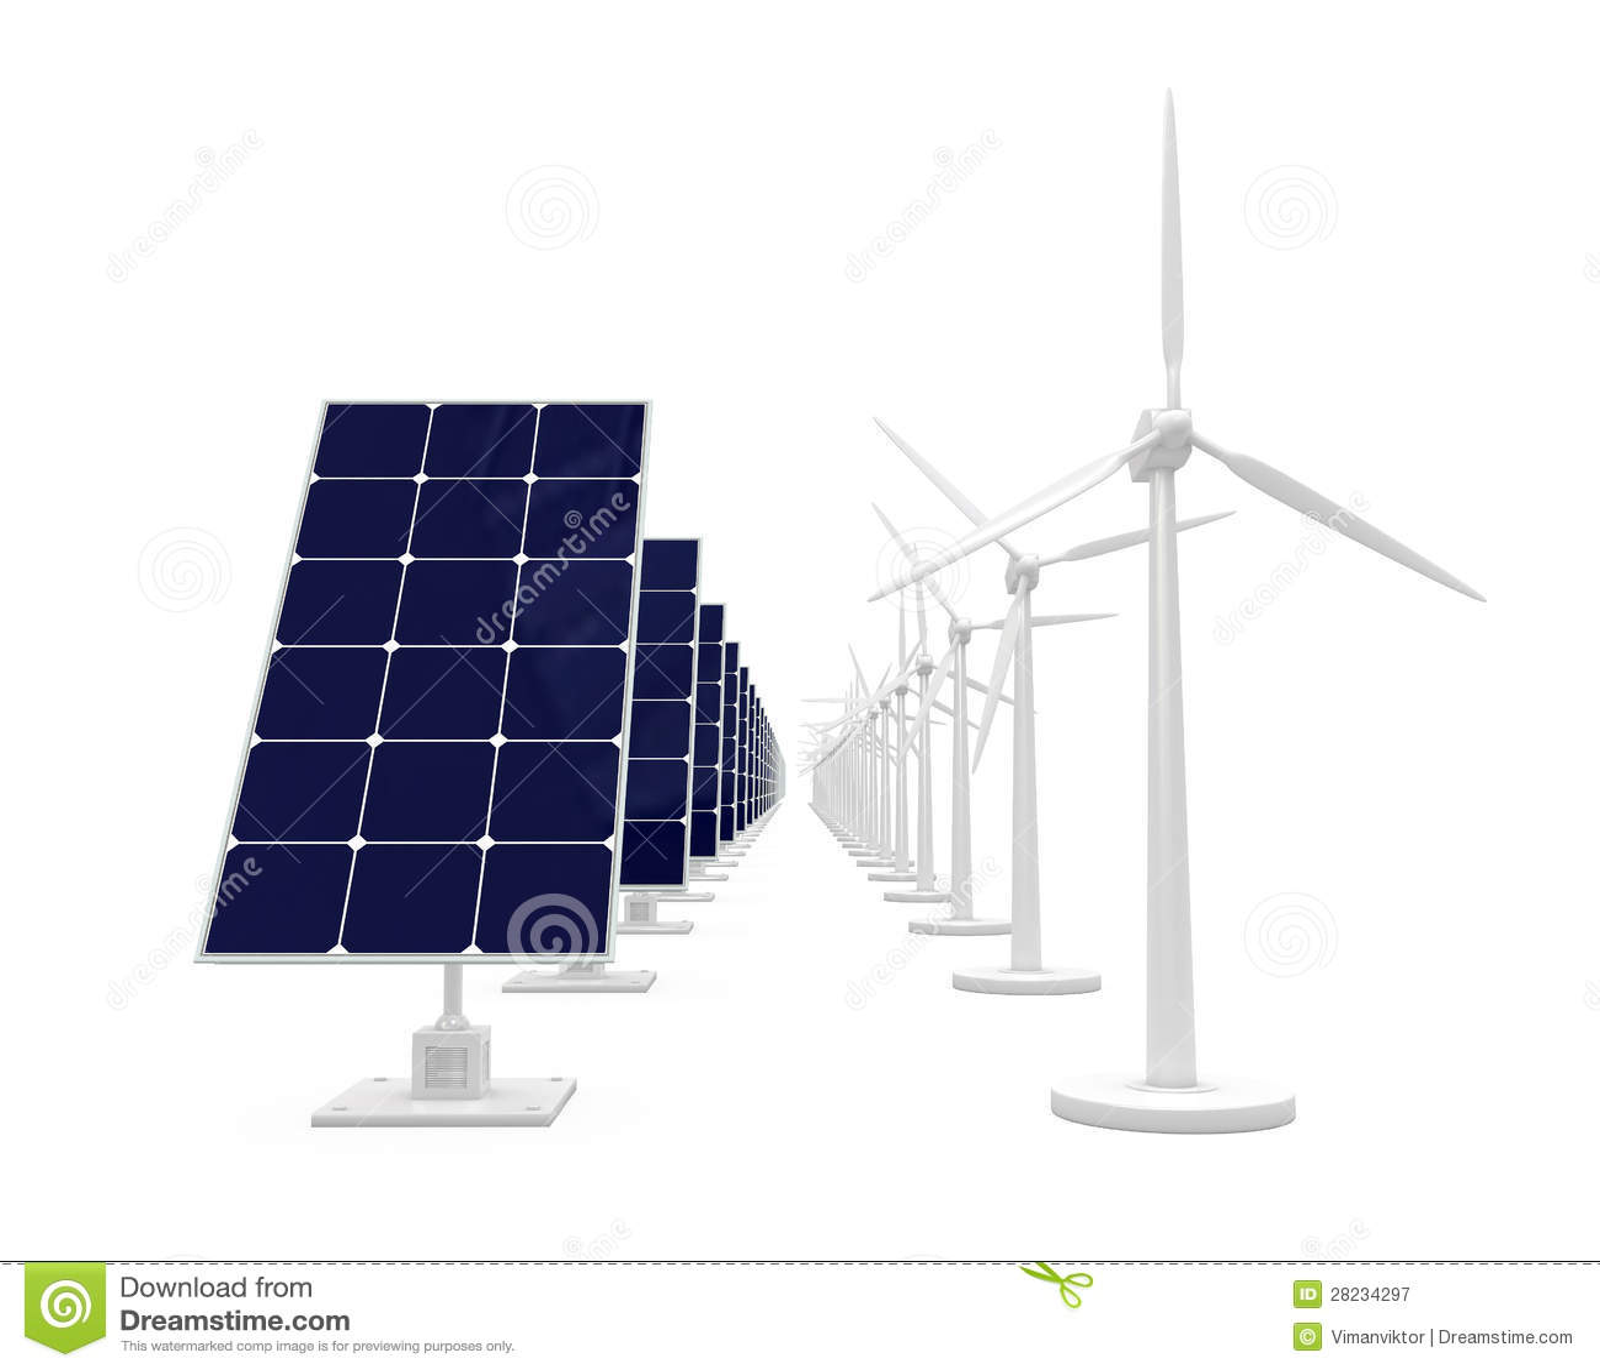 solar energy generation business plan